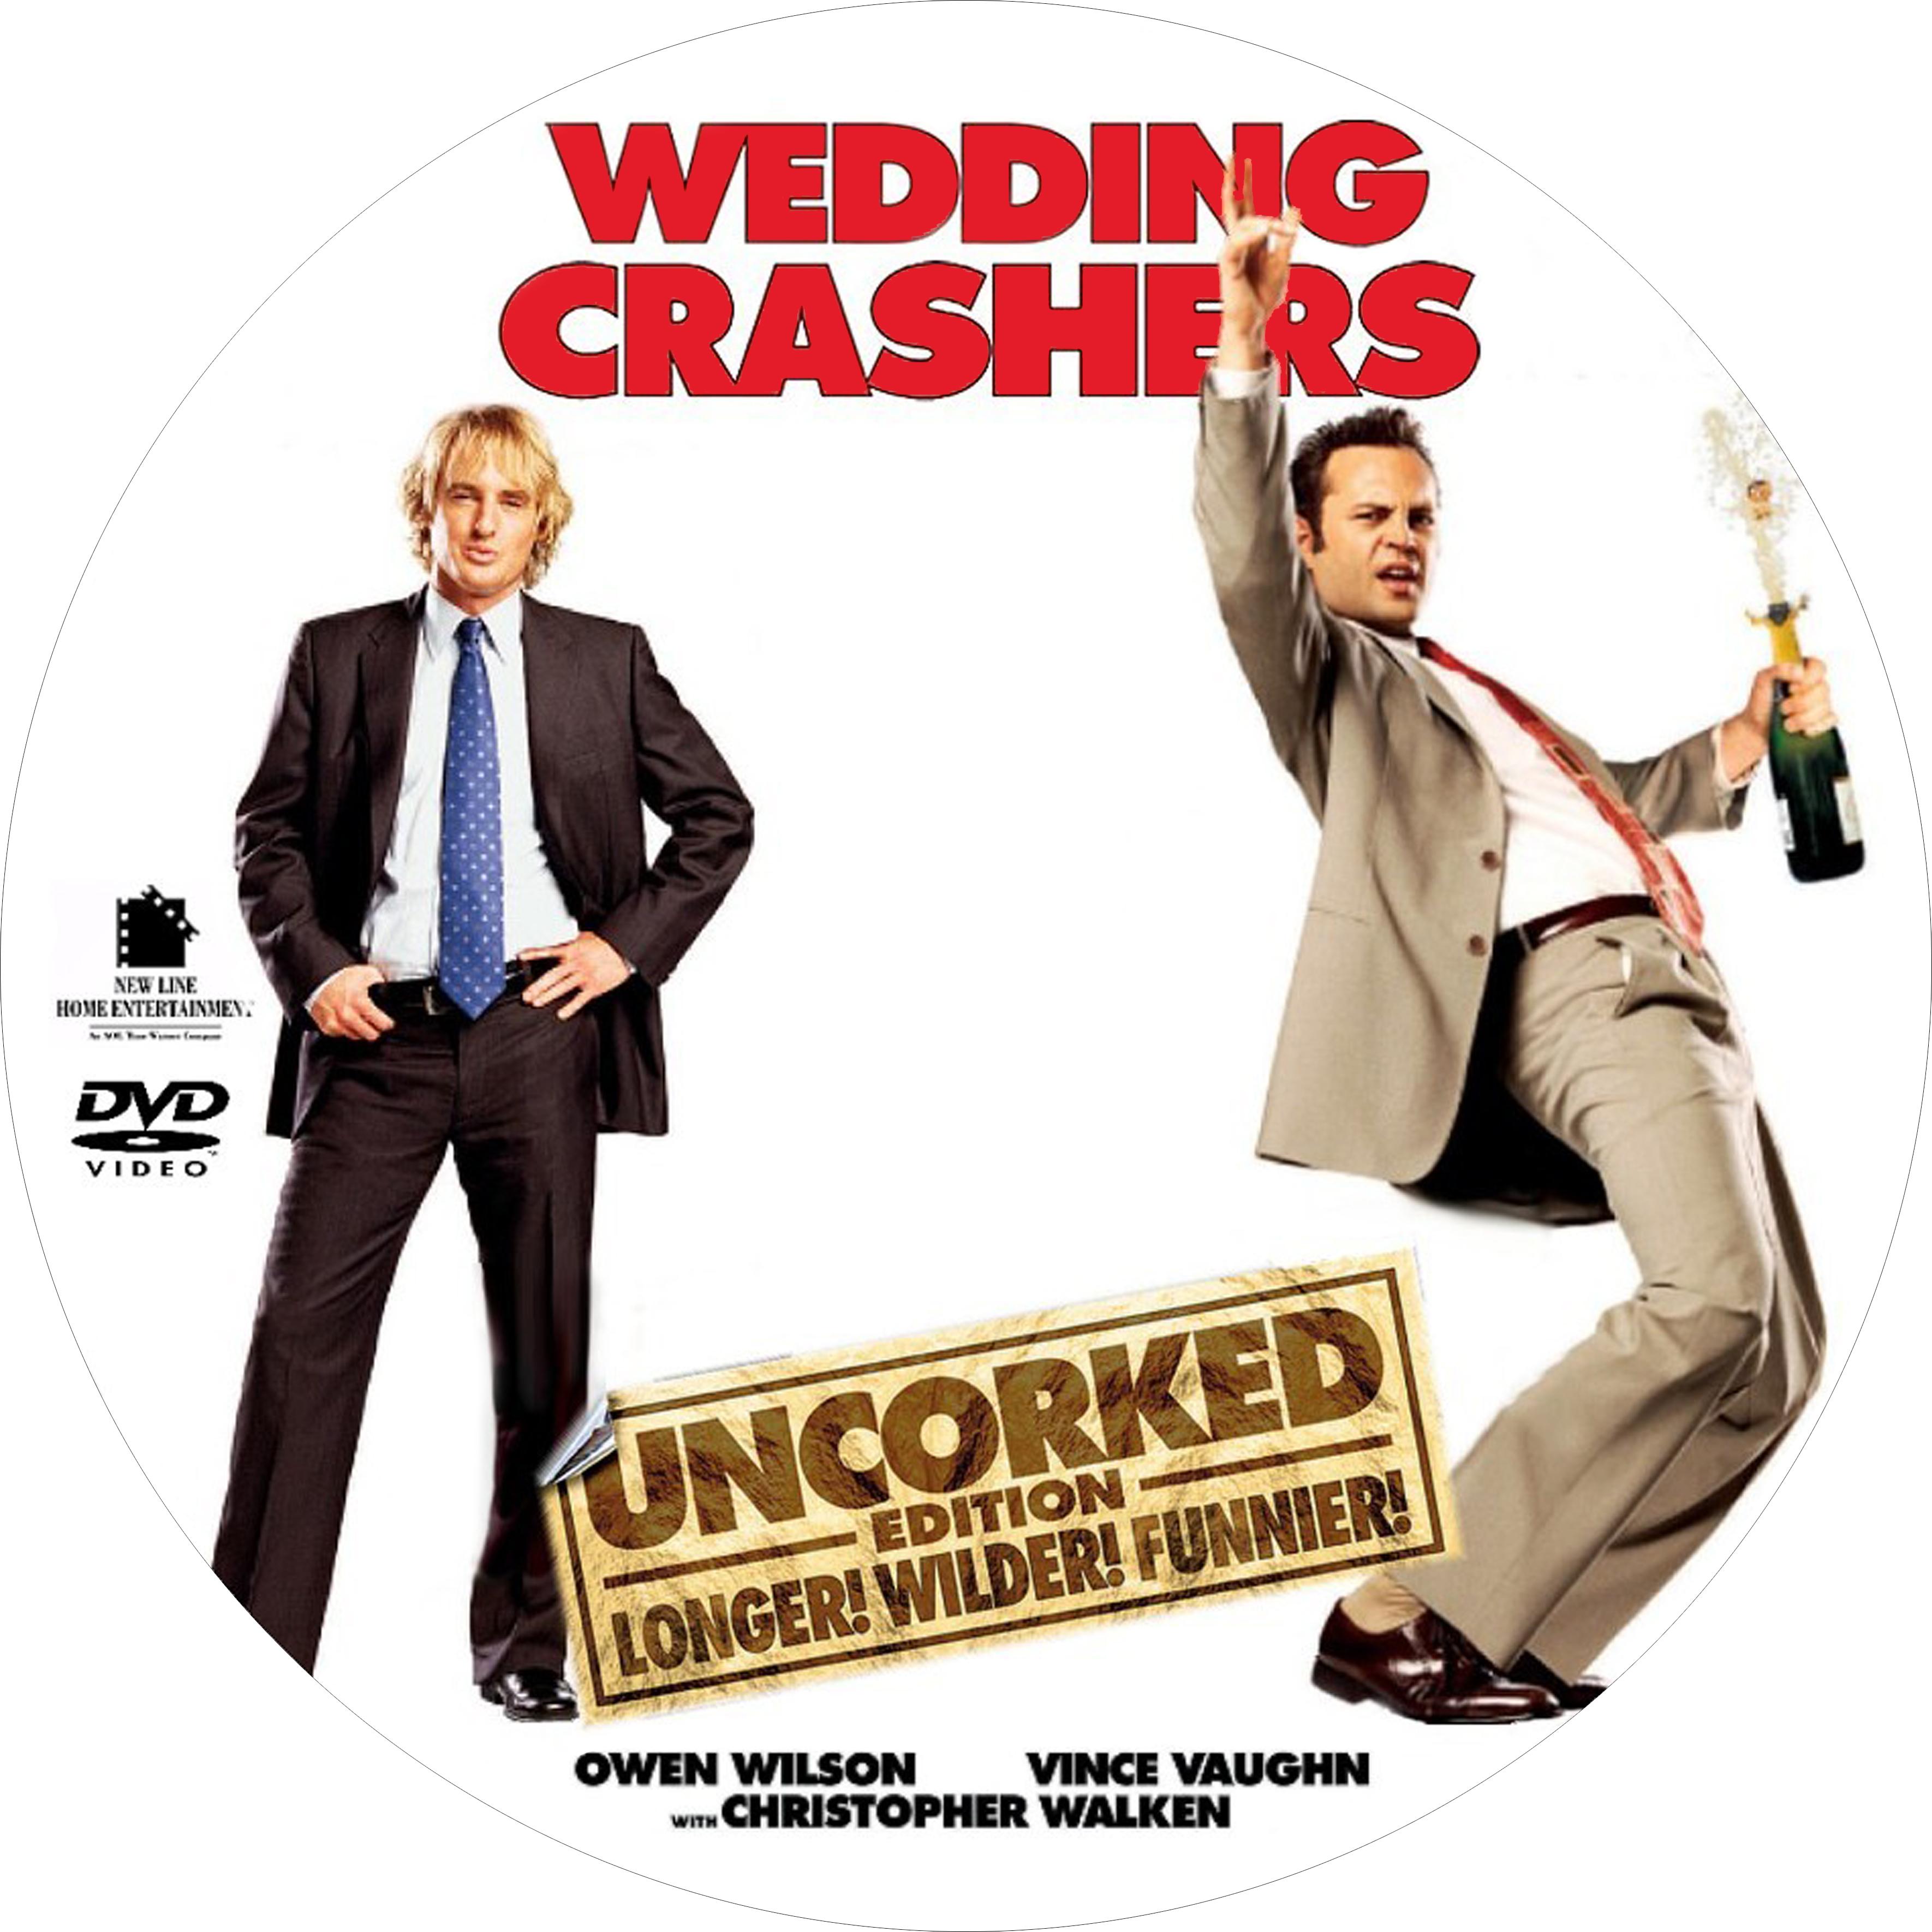 wedding-crashers-awkward-dating-quote-teenhaving-brutal-sex